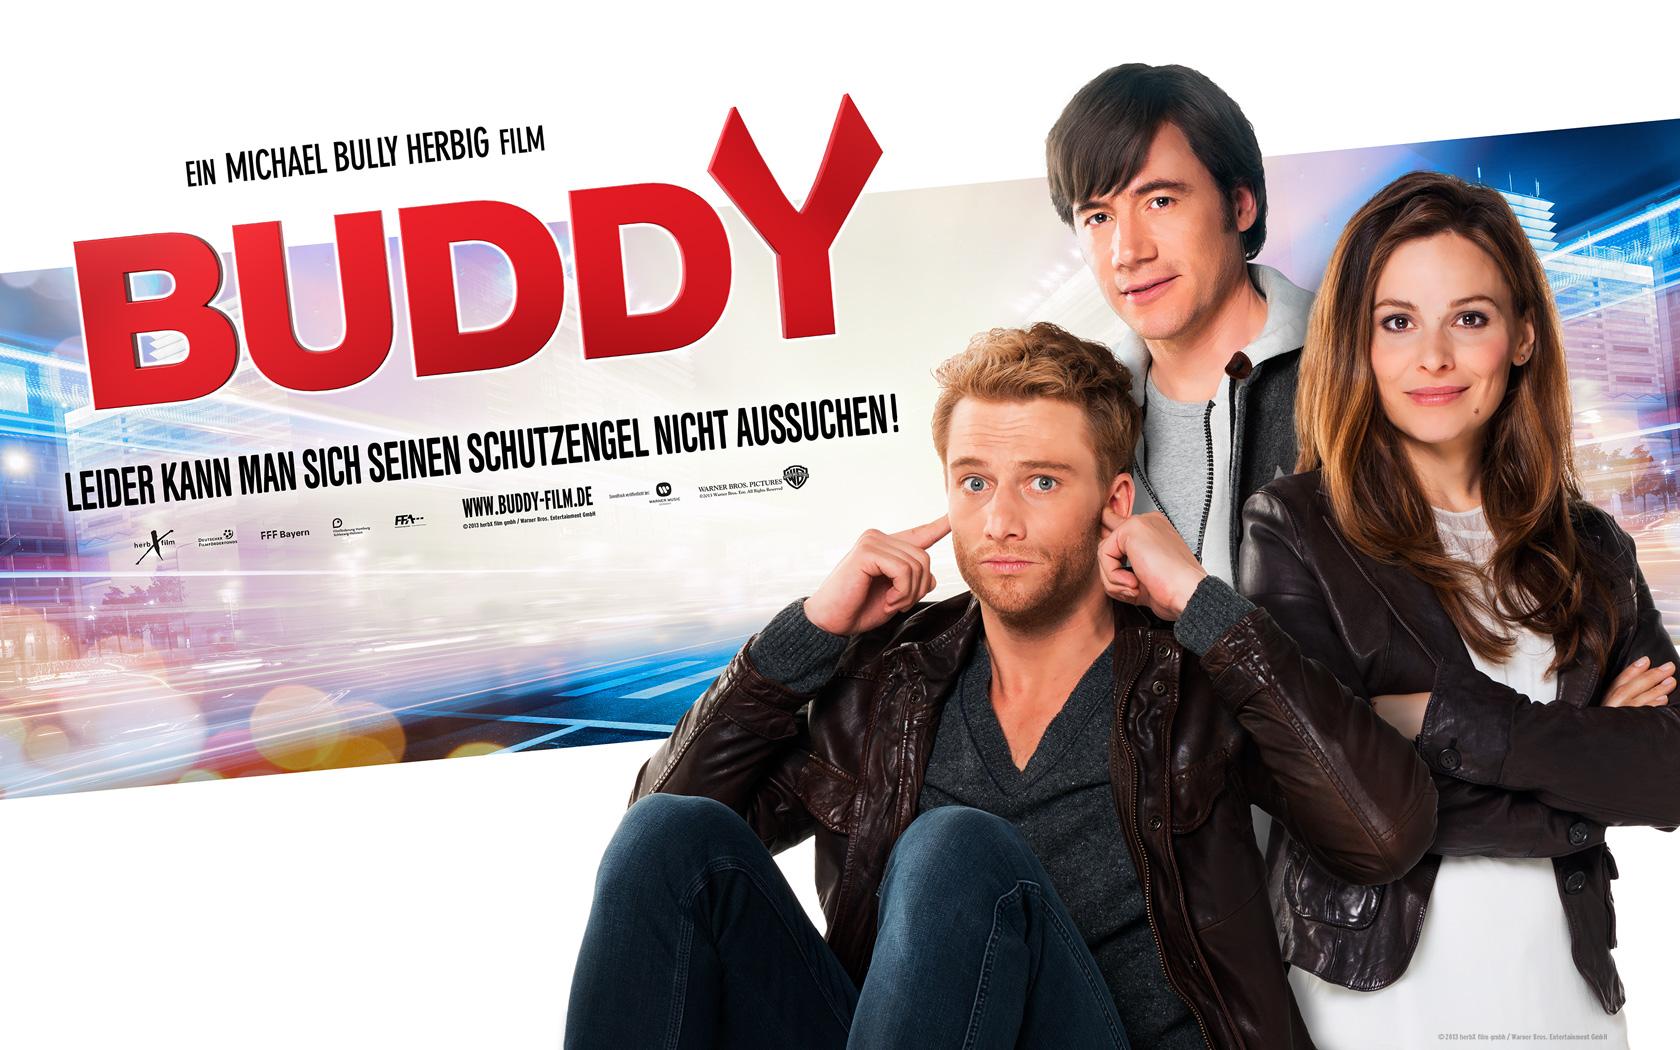 Buddy 2013